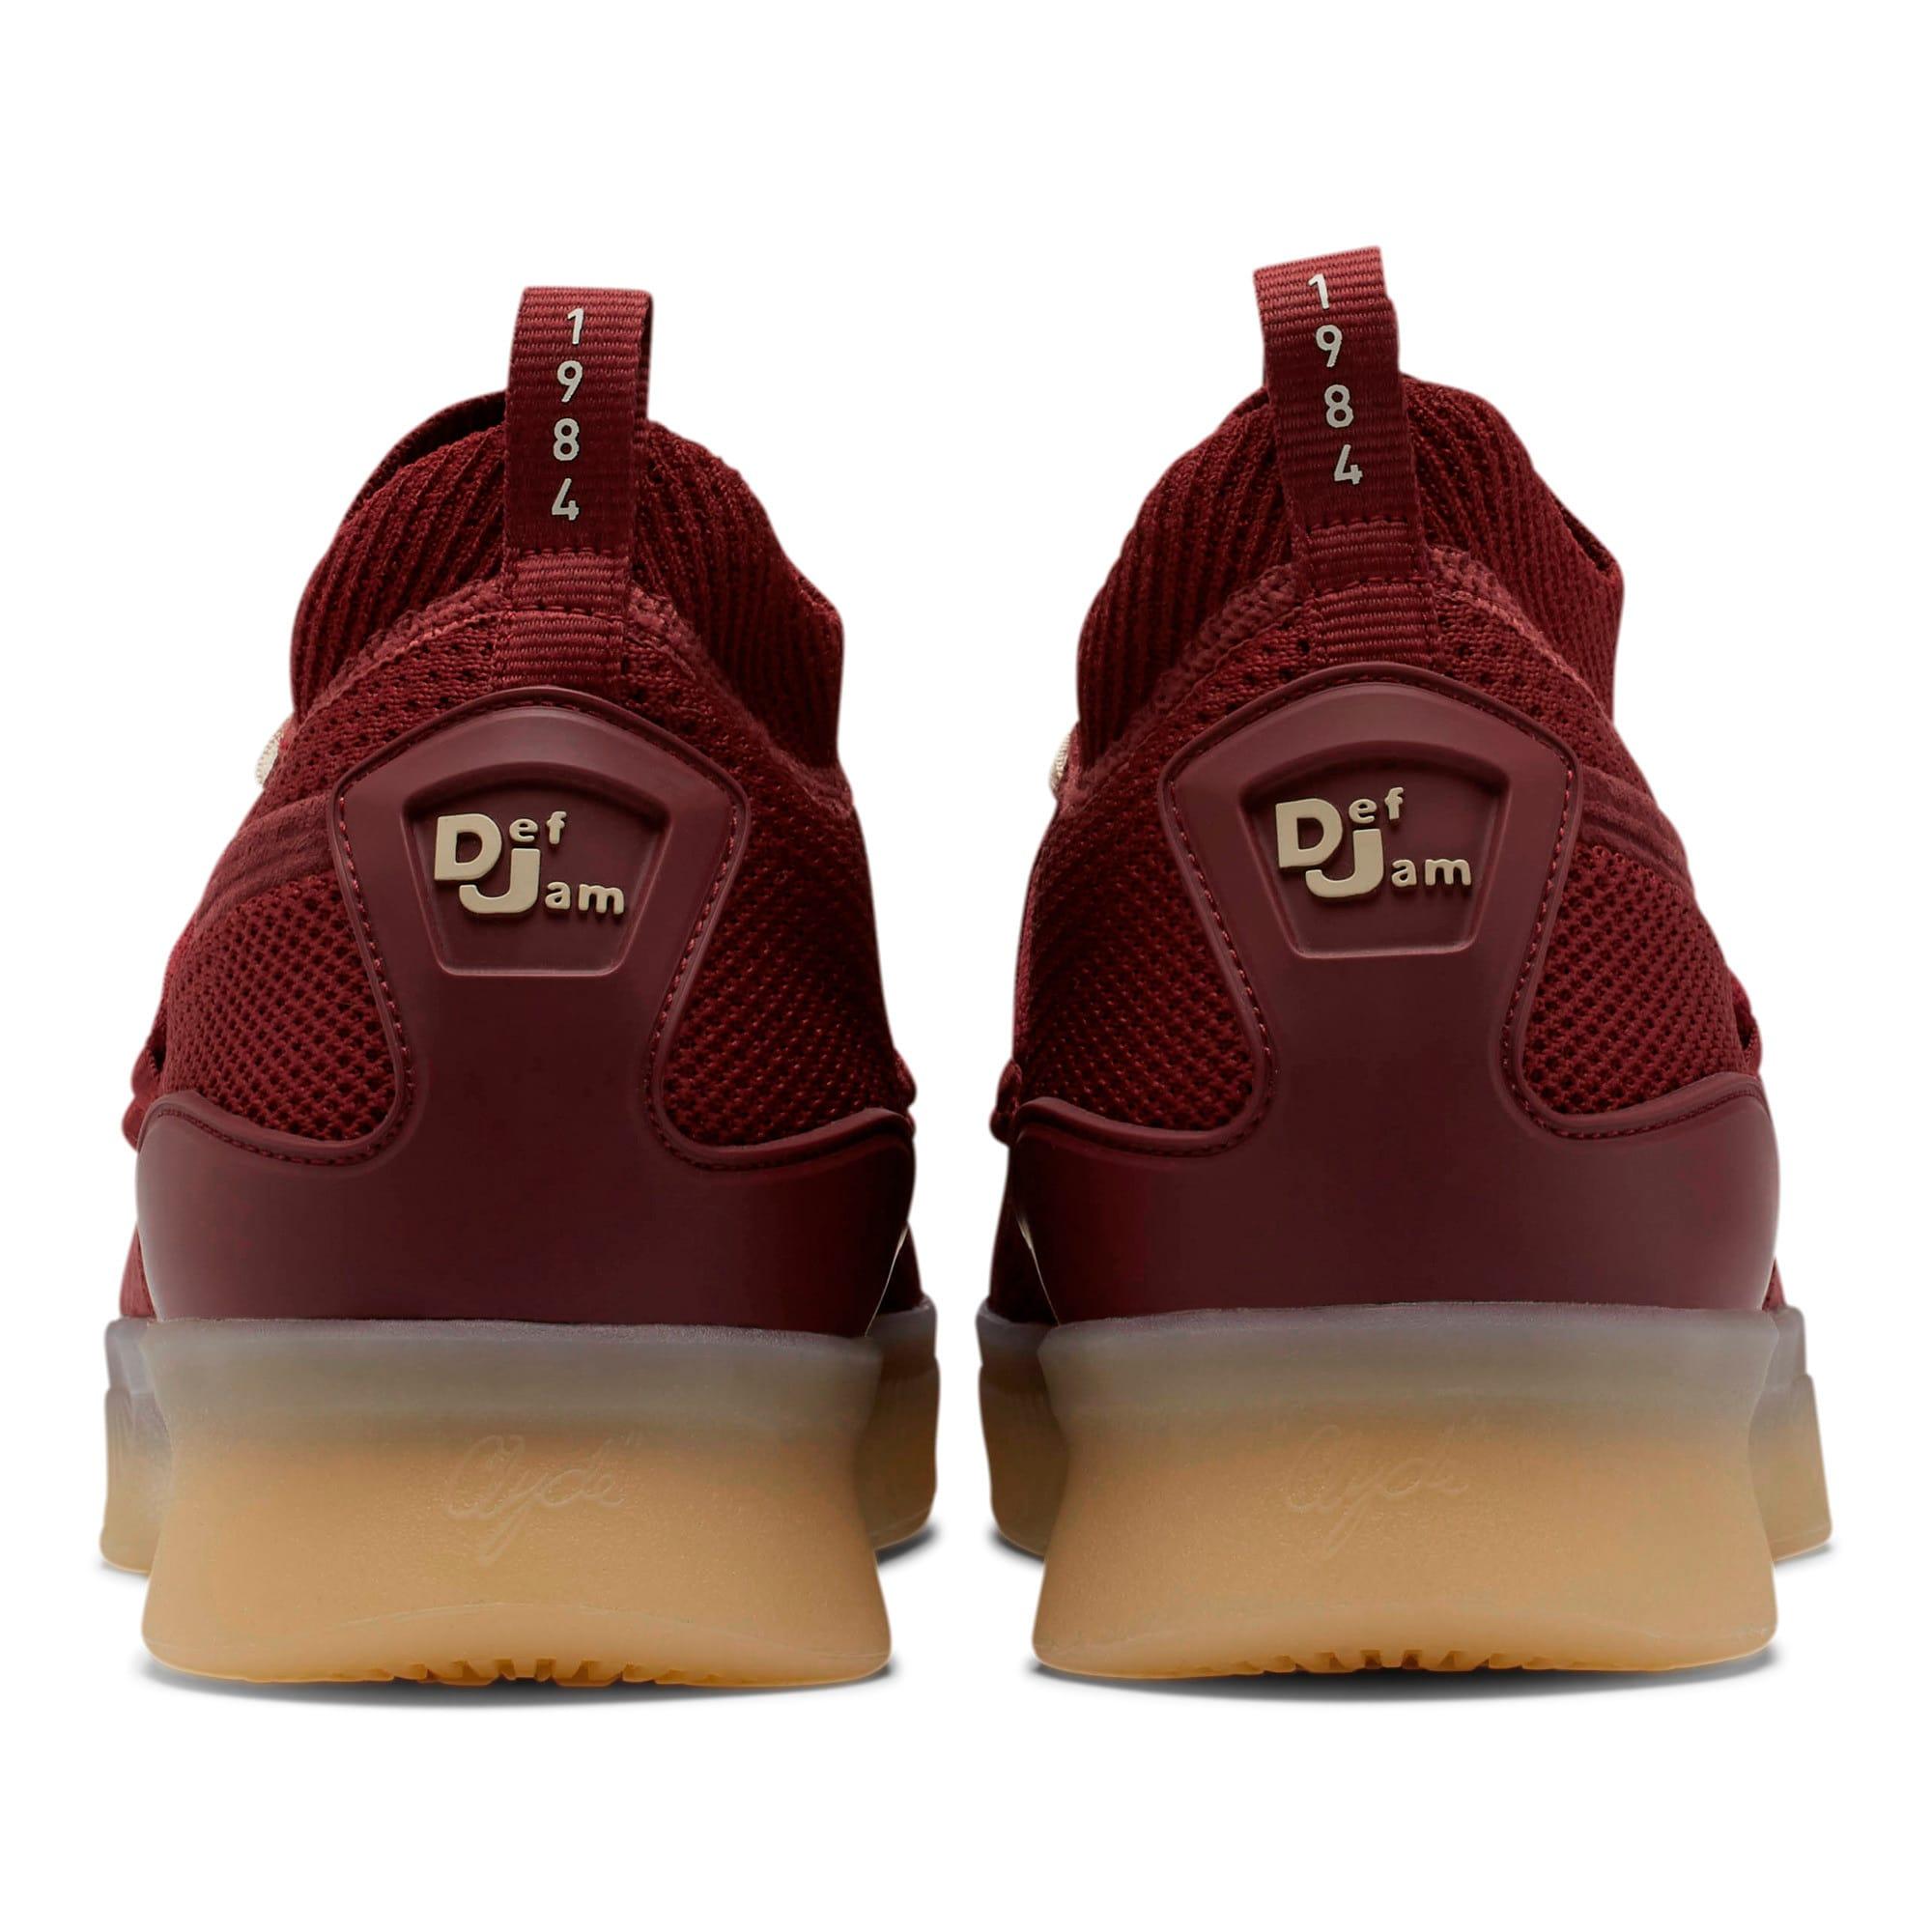 Thumbnail 3 of Clyde Court Def Jam Basketball Shoes, Cordovan, medium